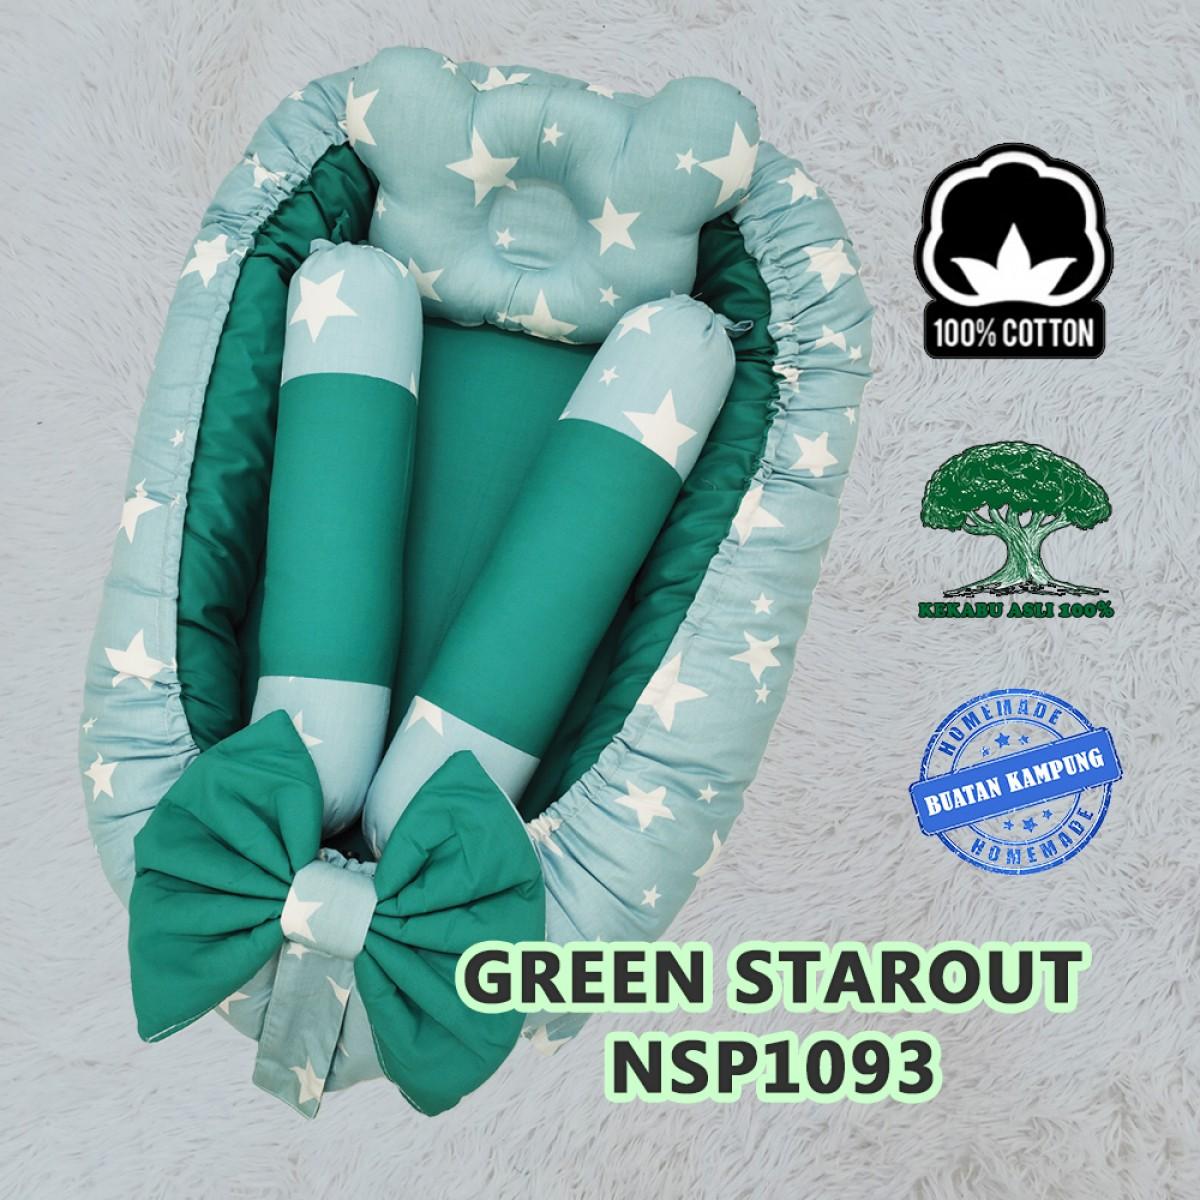 Green Starout - Kico Baby Center